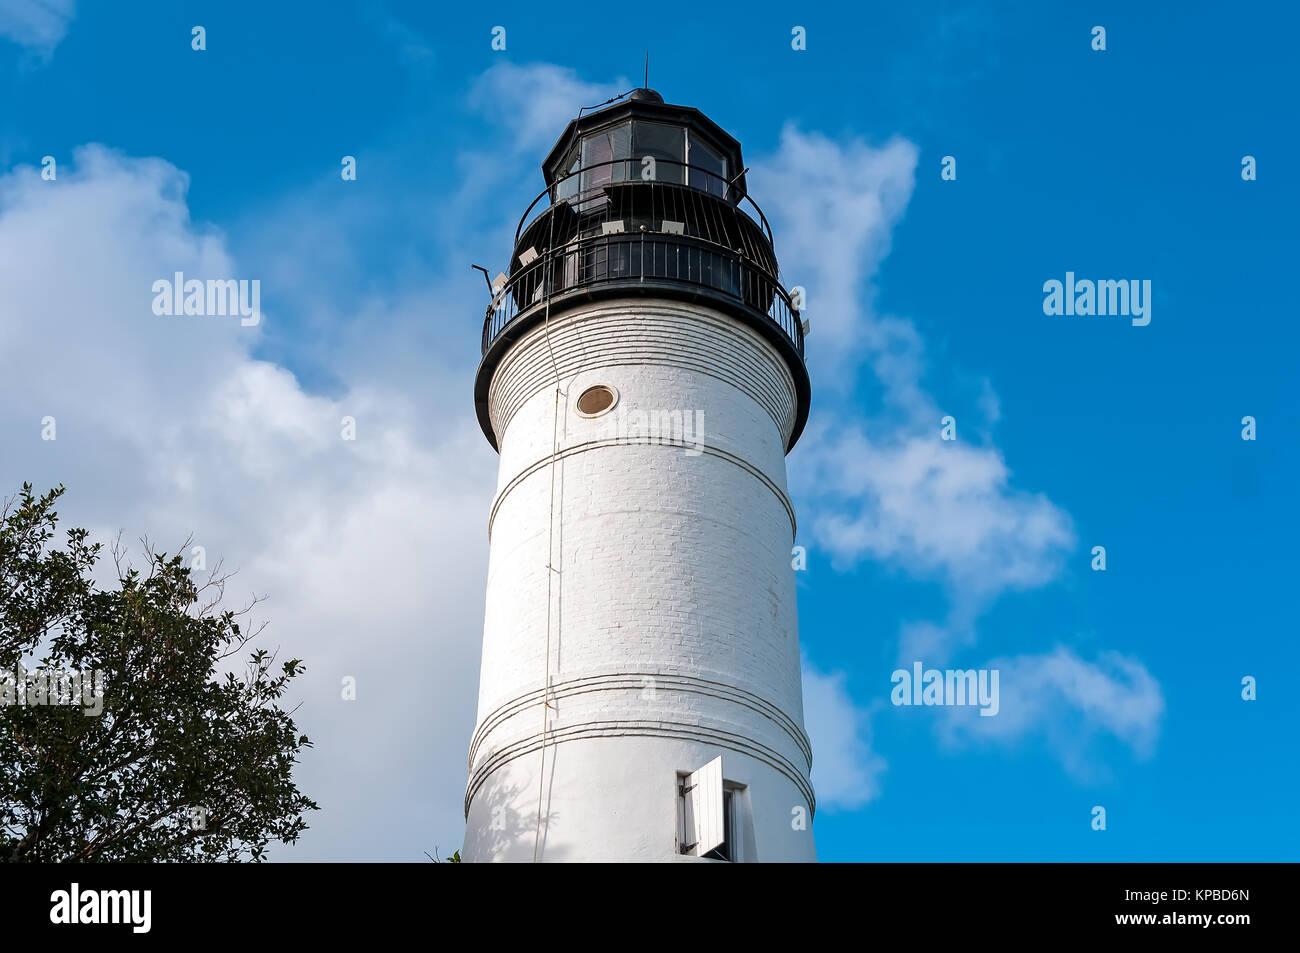 Key West lighthouse tower top, Whitehead St, Key West, Florida - Stock Image